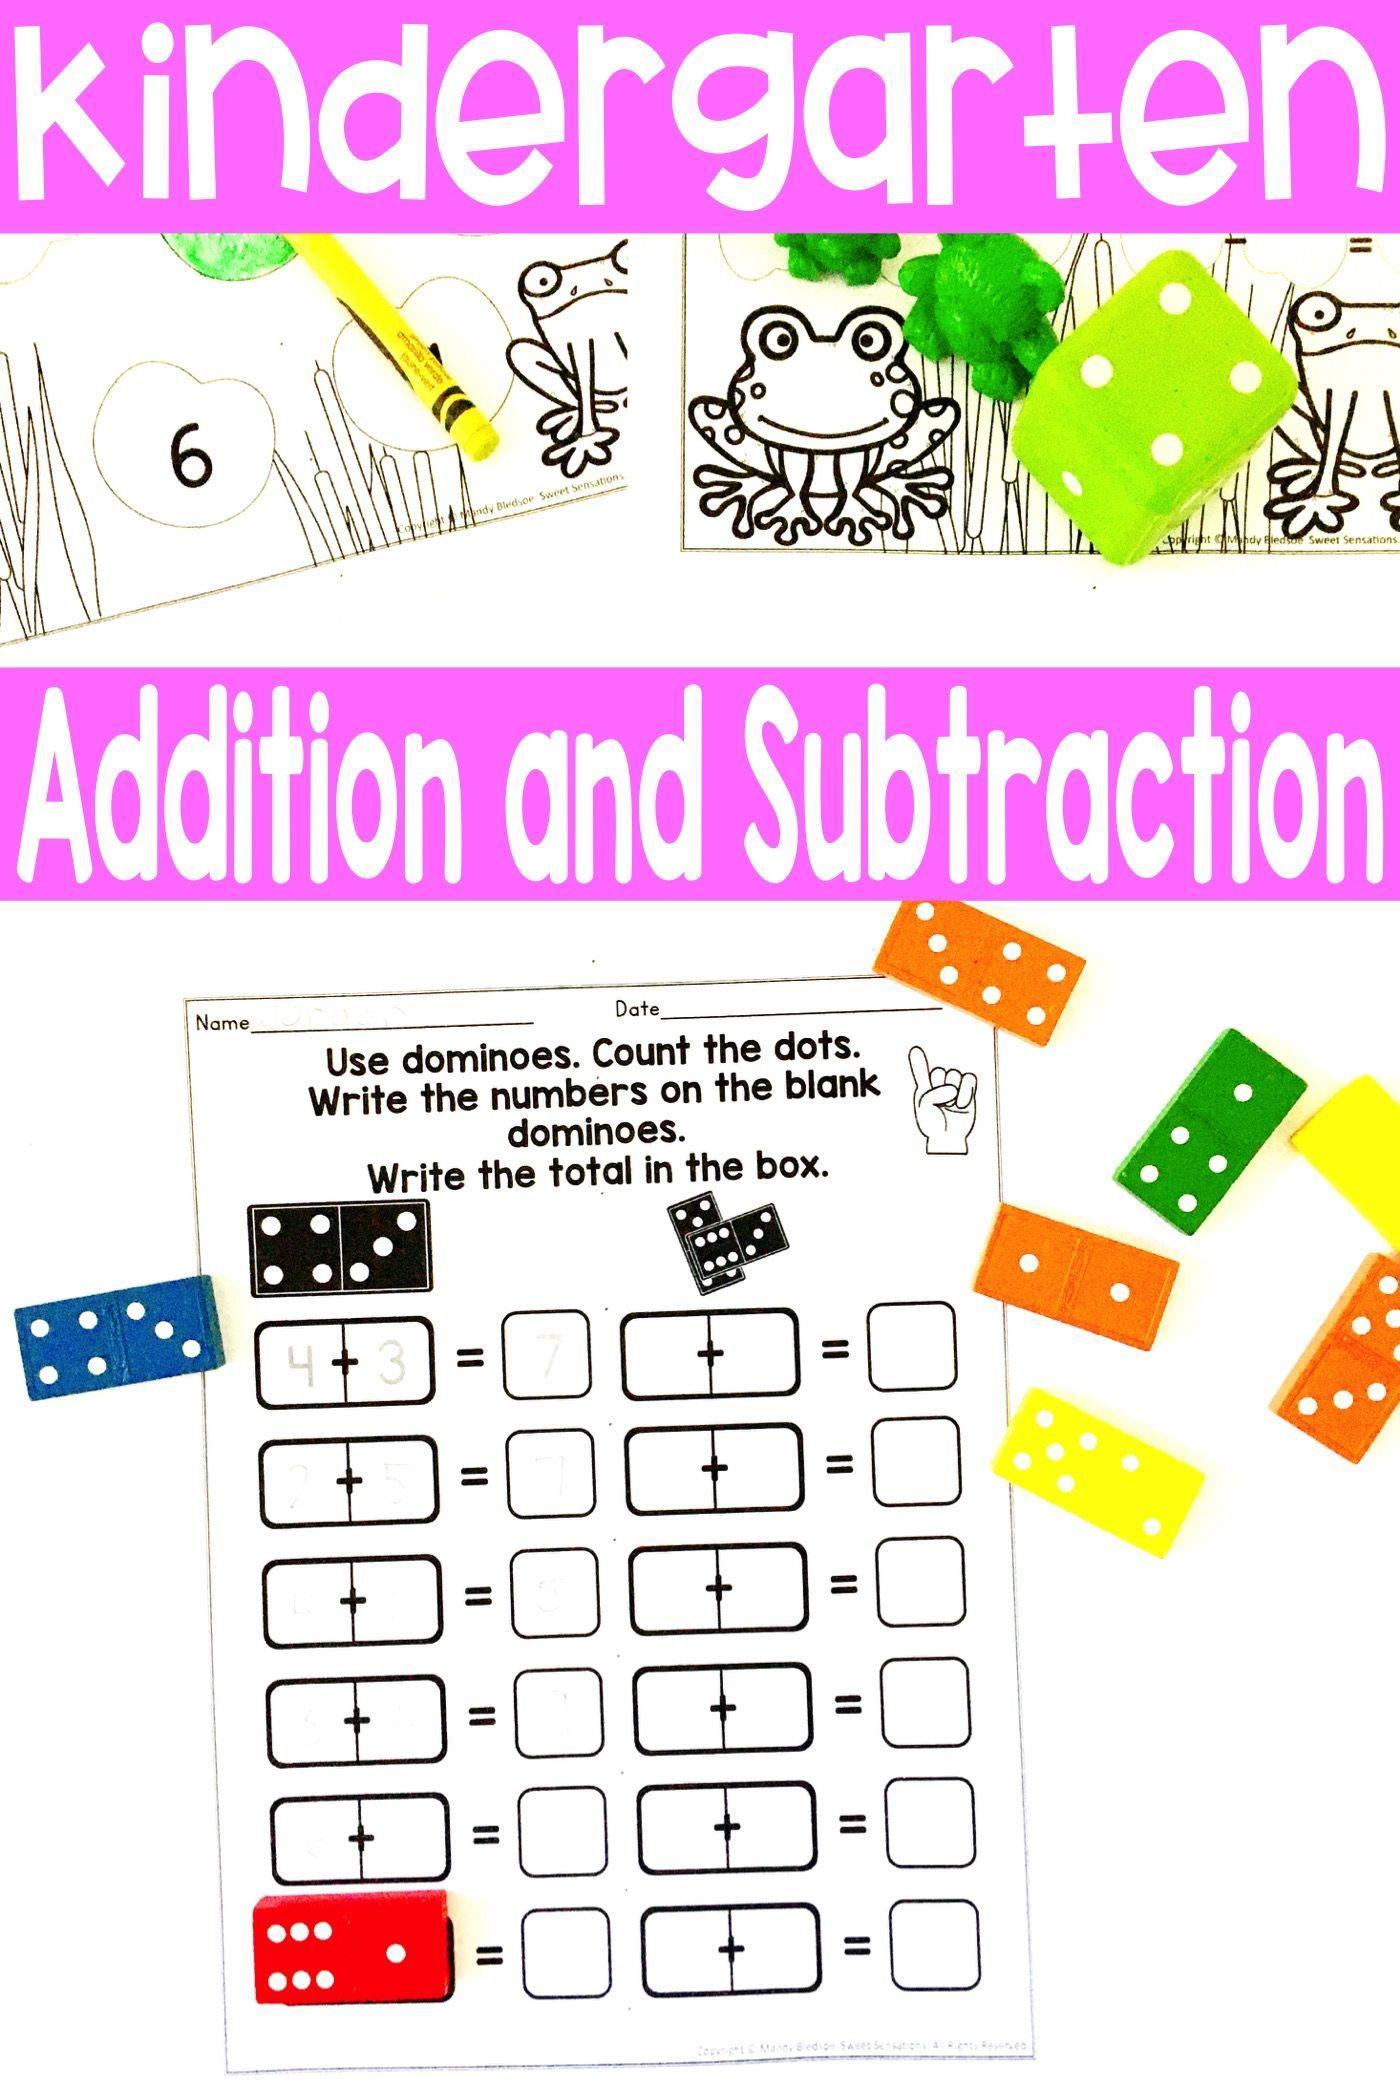 Addition Subtraction Solve Word Problems Math Worksheets Bar Model Tape Diagram Singapore Math Math Word Problems Solving Word Problems